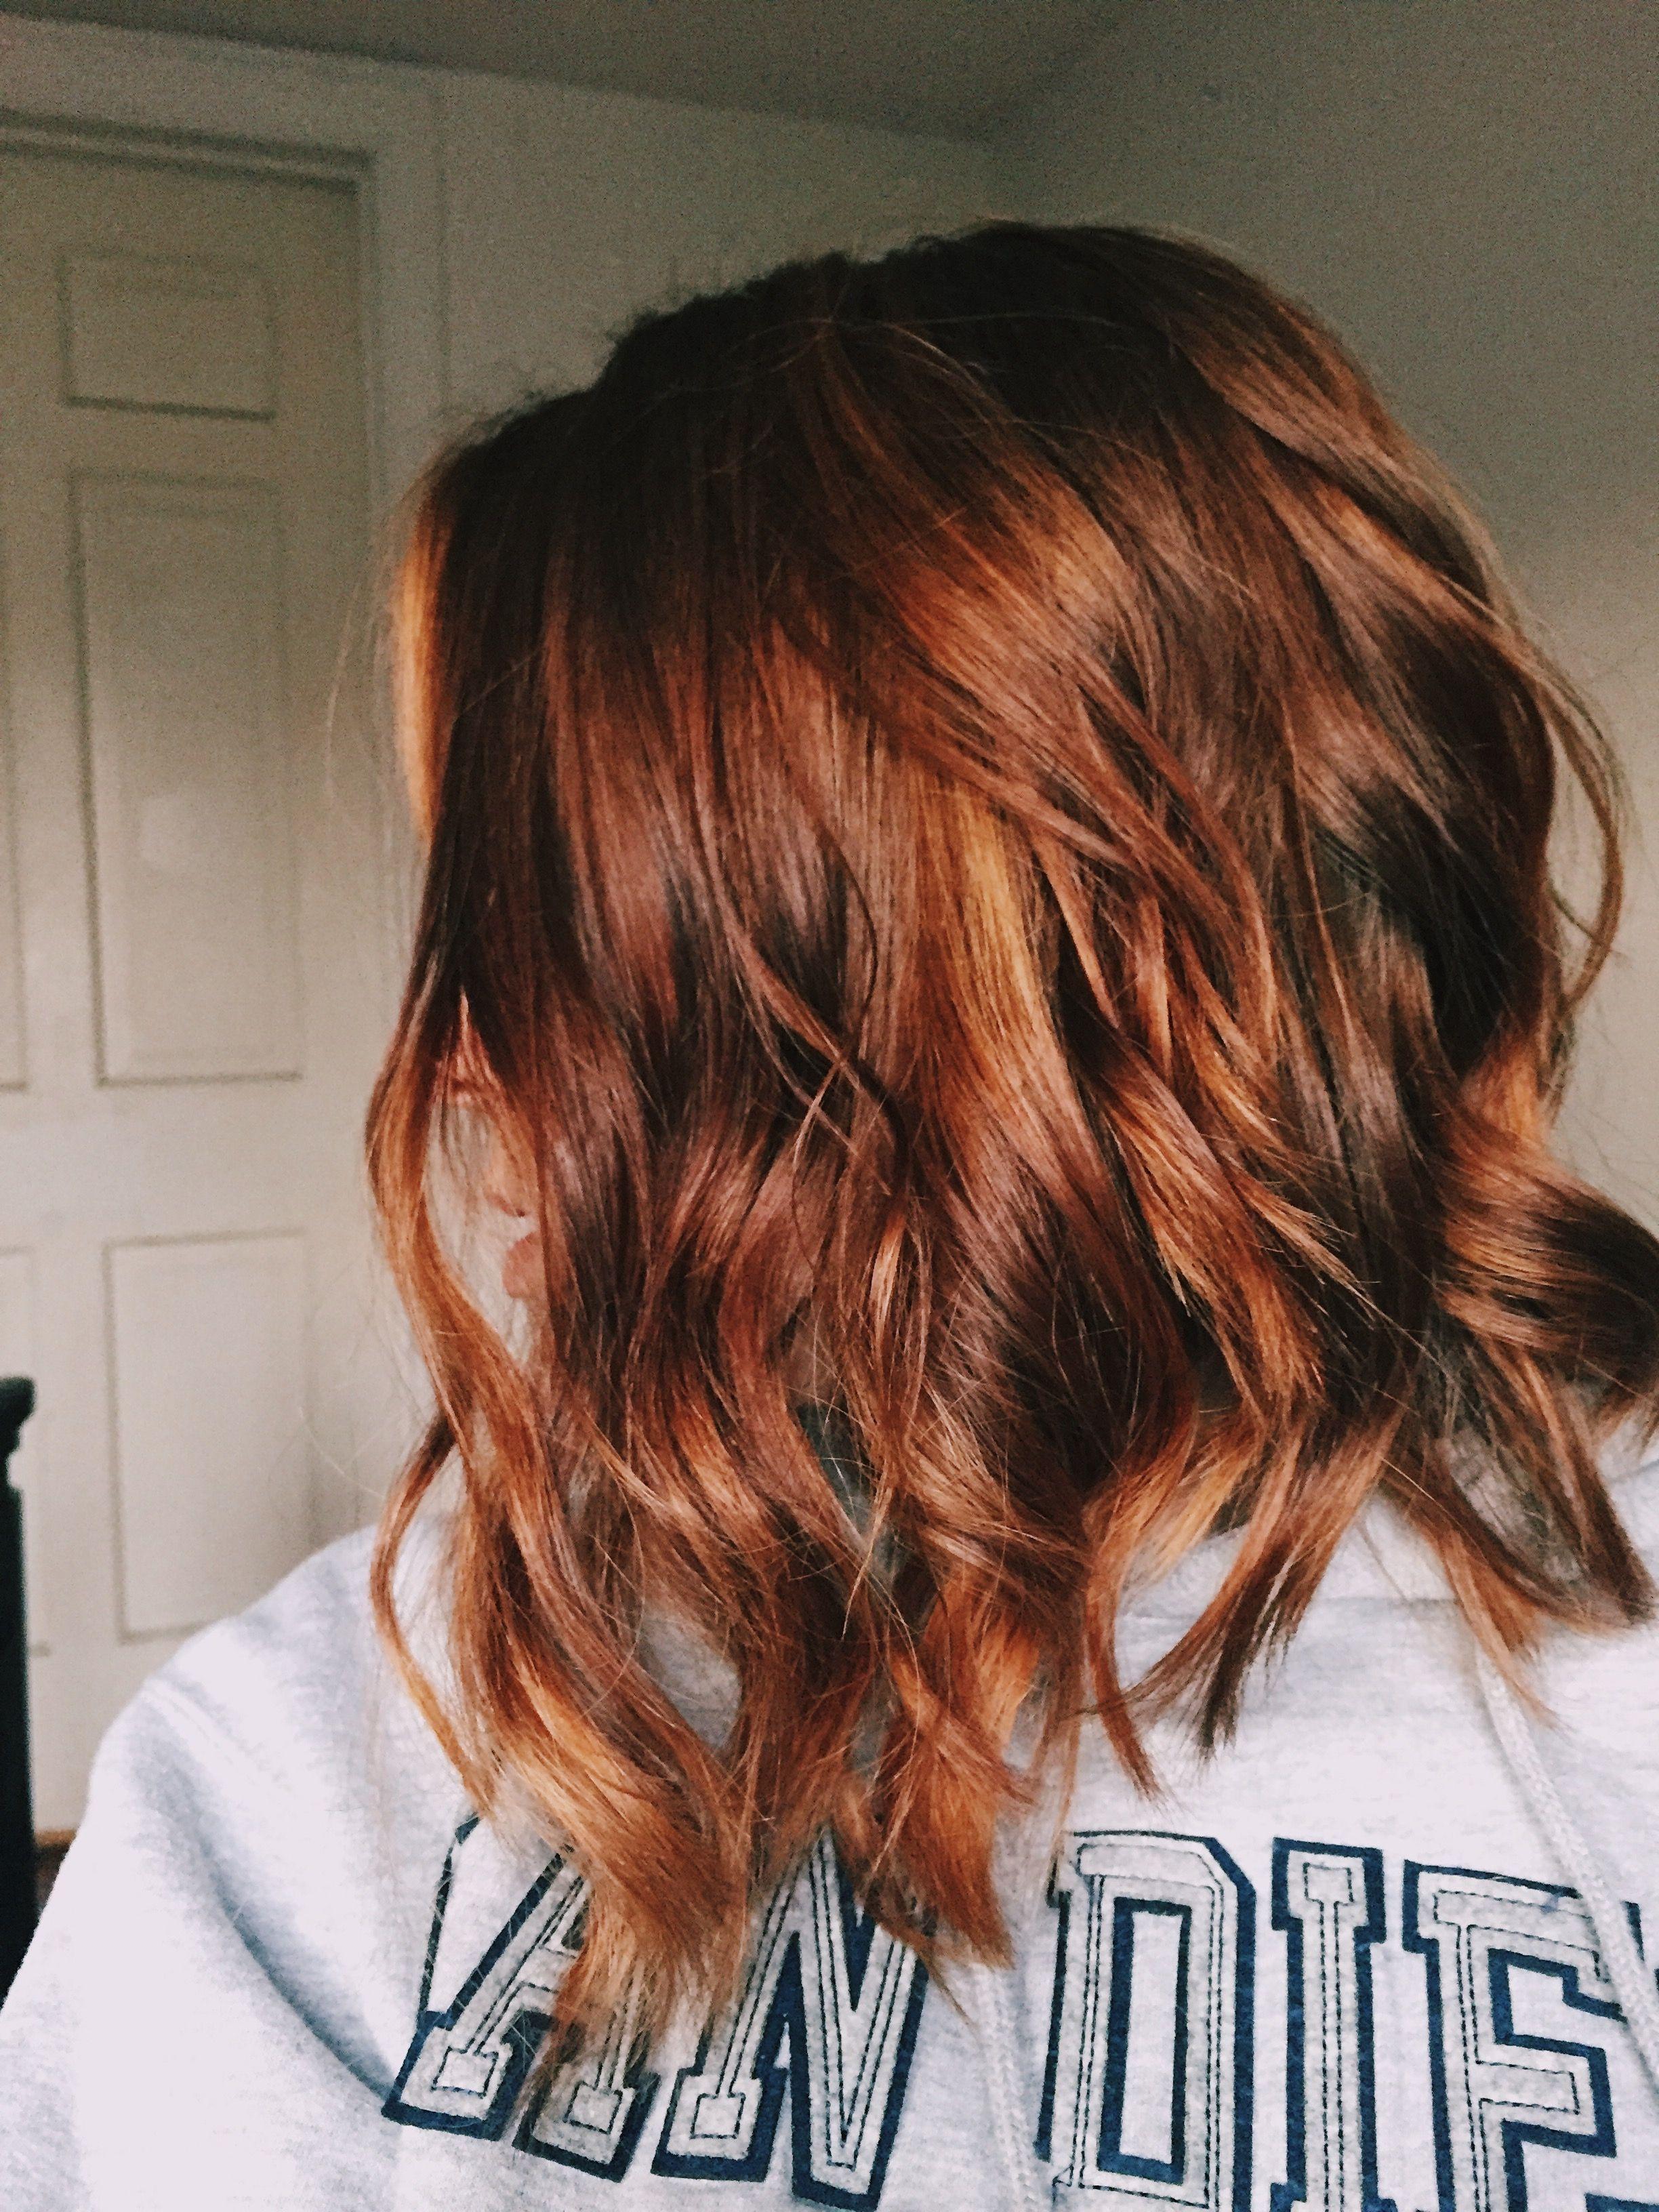 Reddish Brown Hair Hair In 2019 Hair Styles Hair